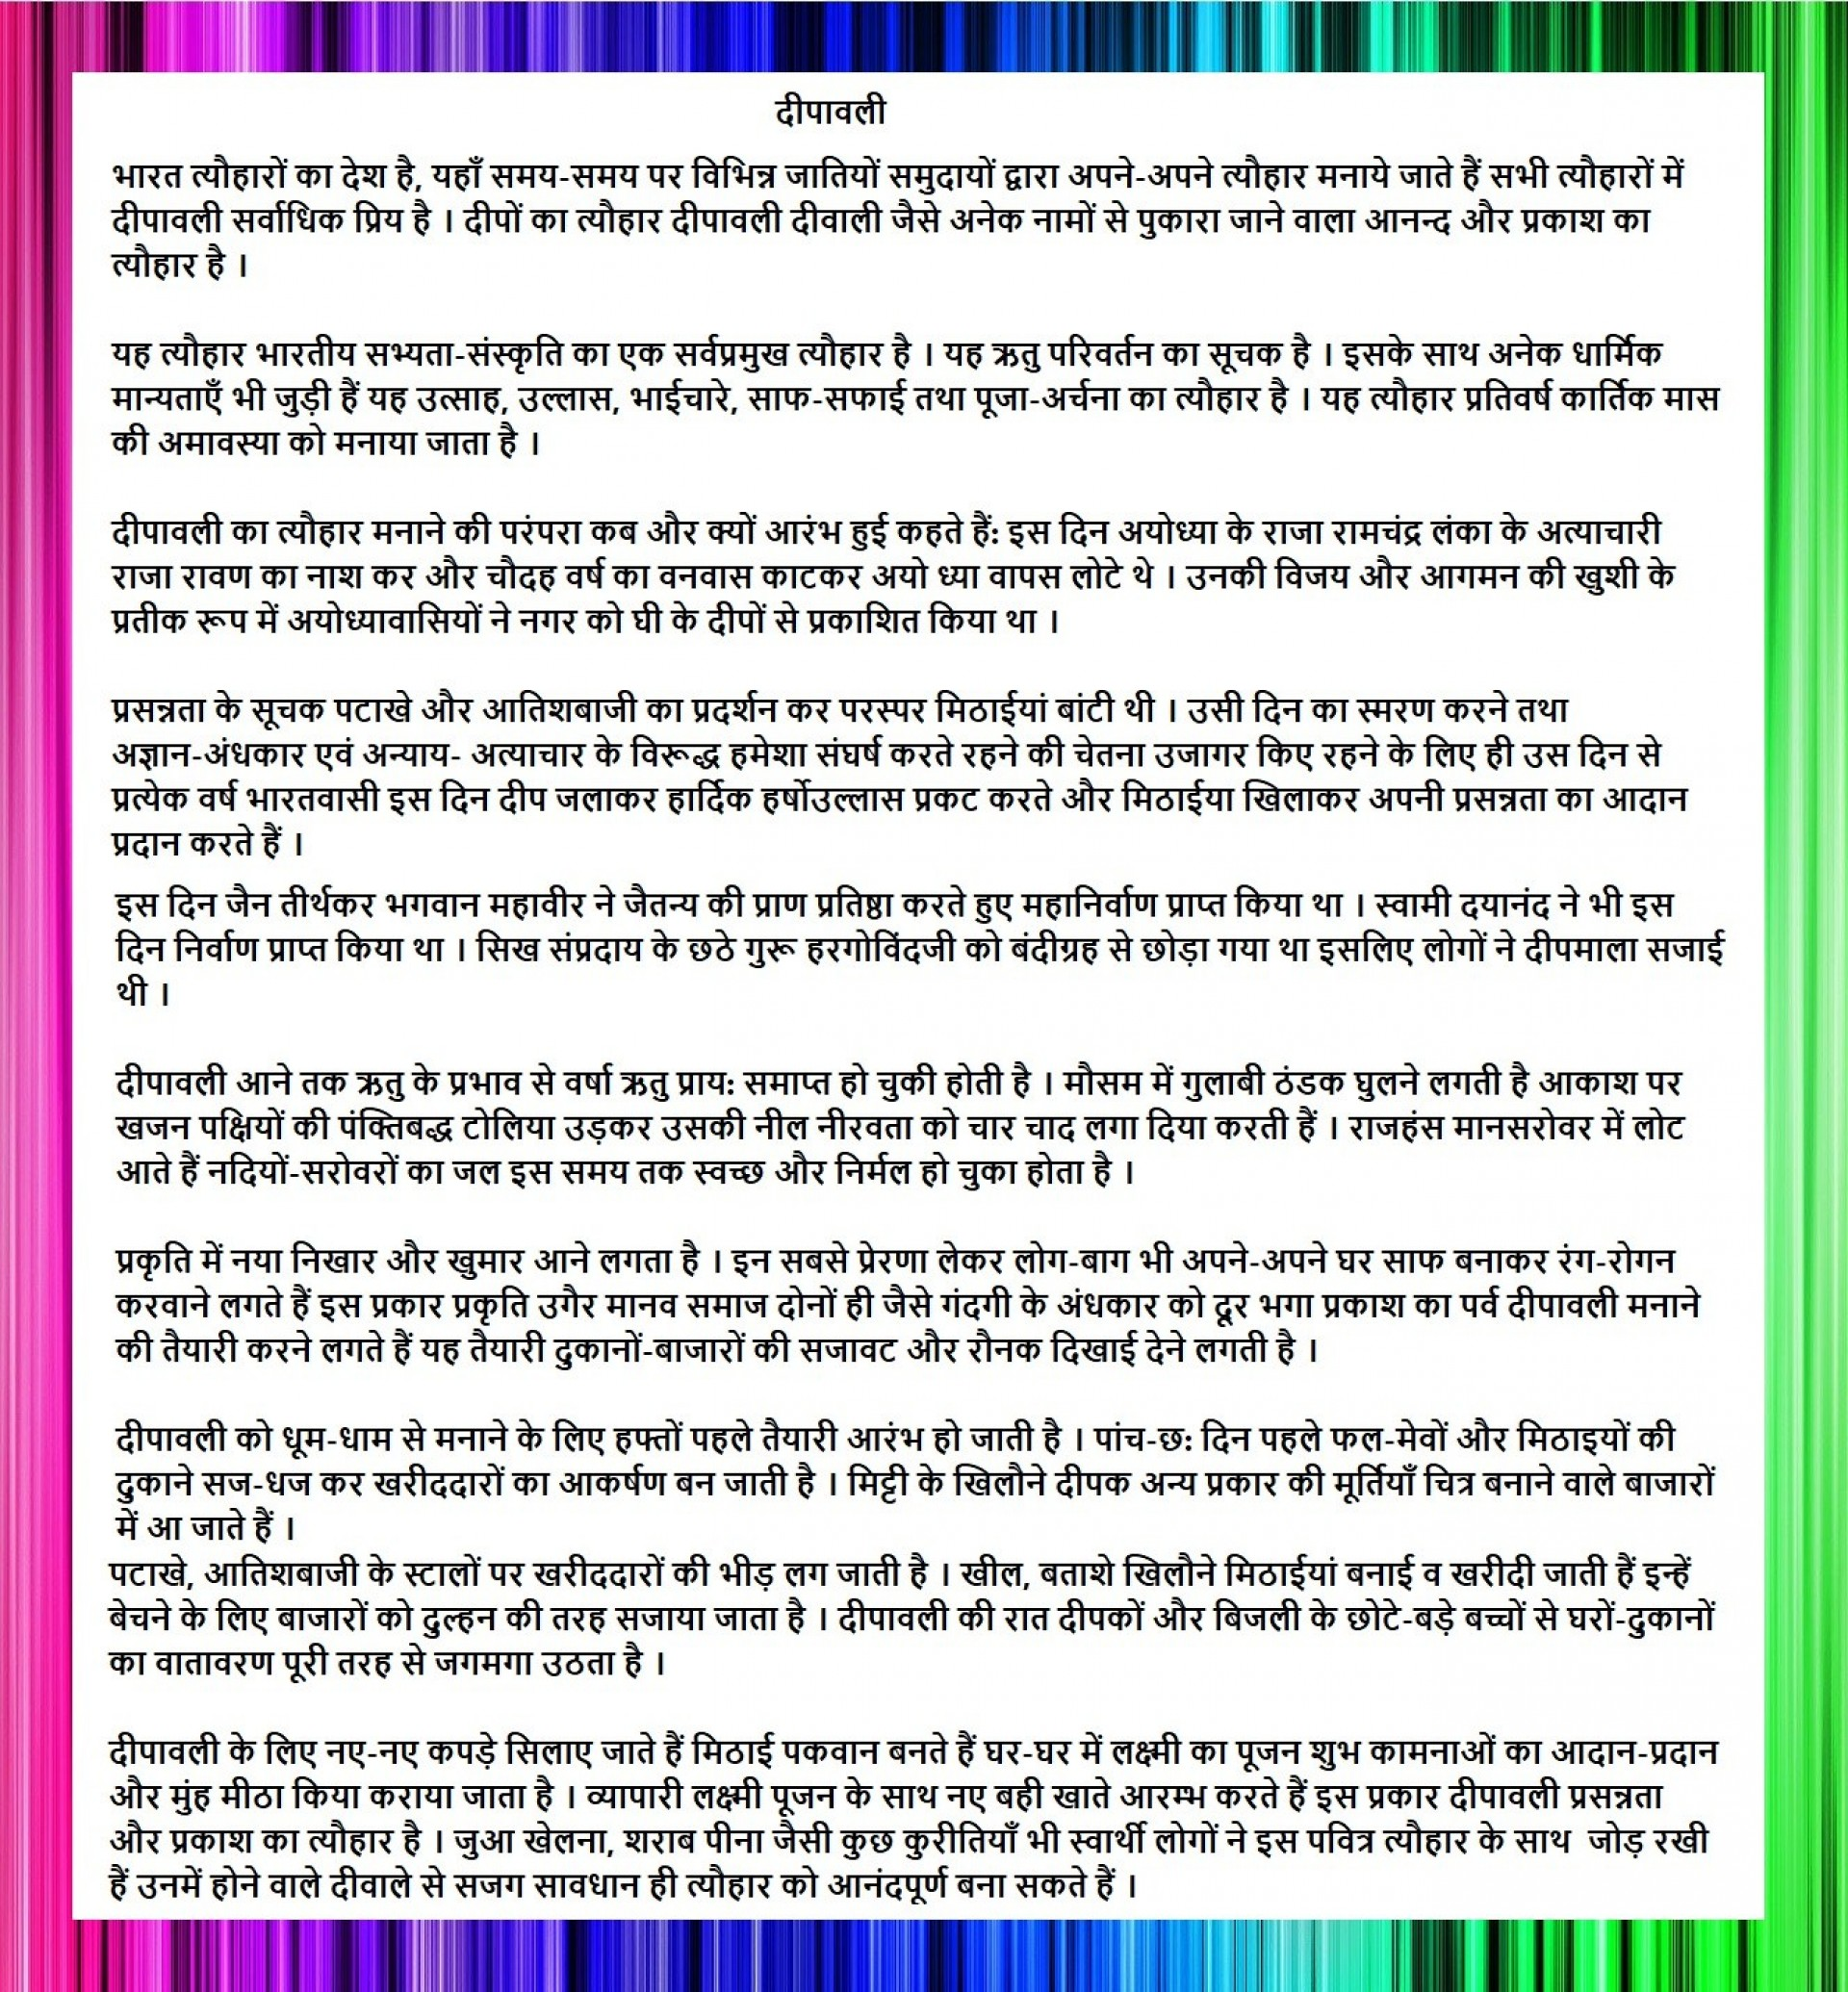 004 Deepavali Festival Essay In Tamil Happy Diwali For School Students Hindiresizeu003d5602c604 Unbelievable Christmas Language 1920